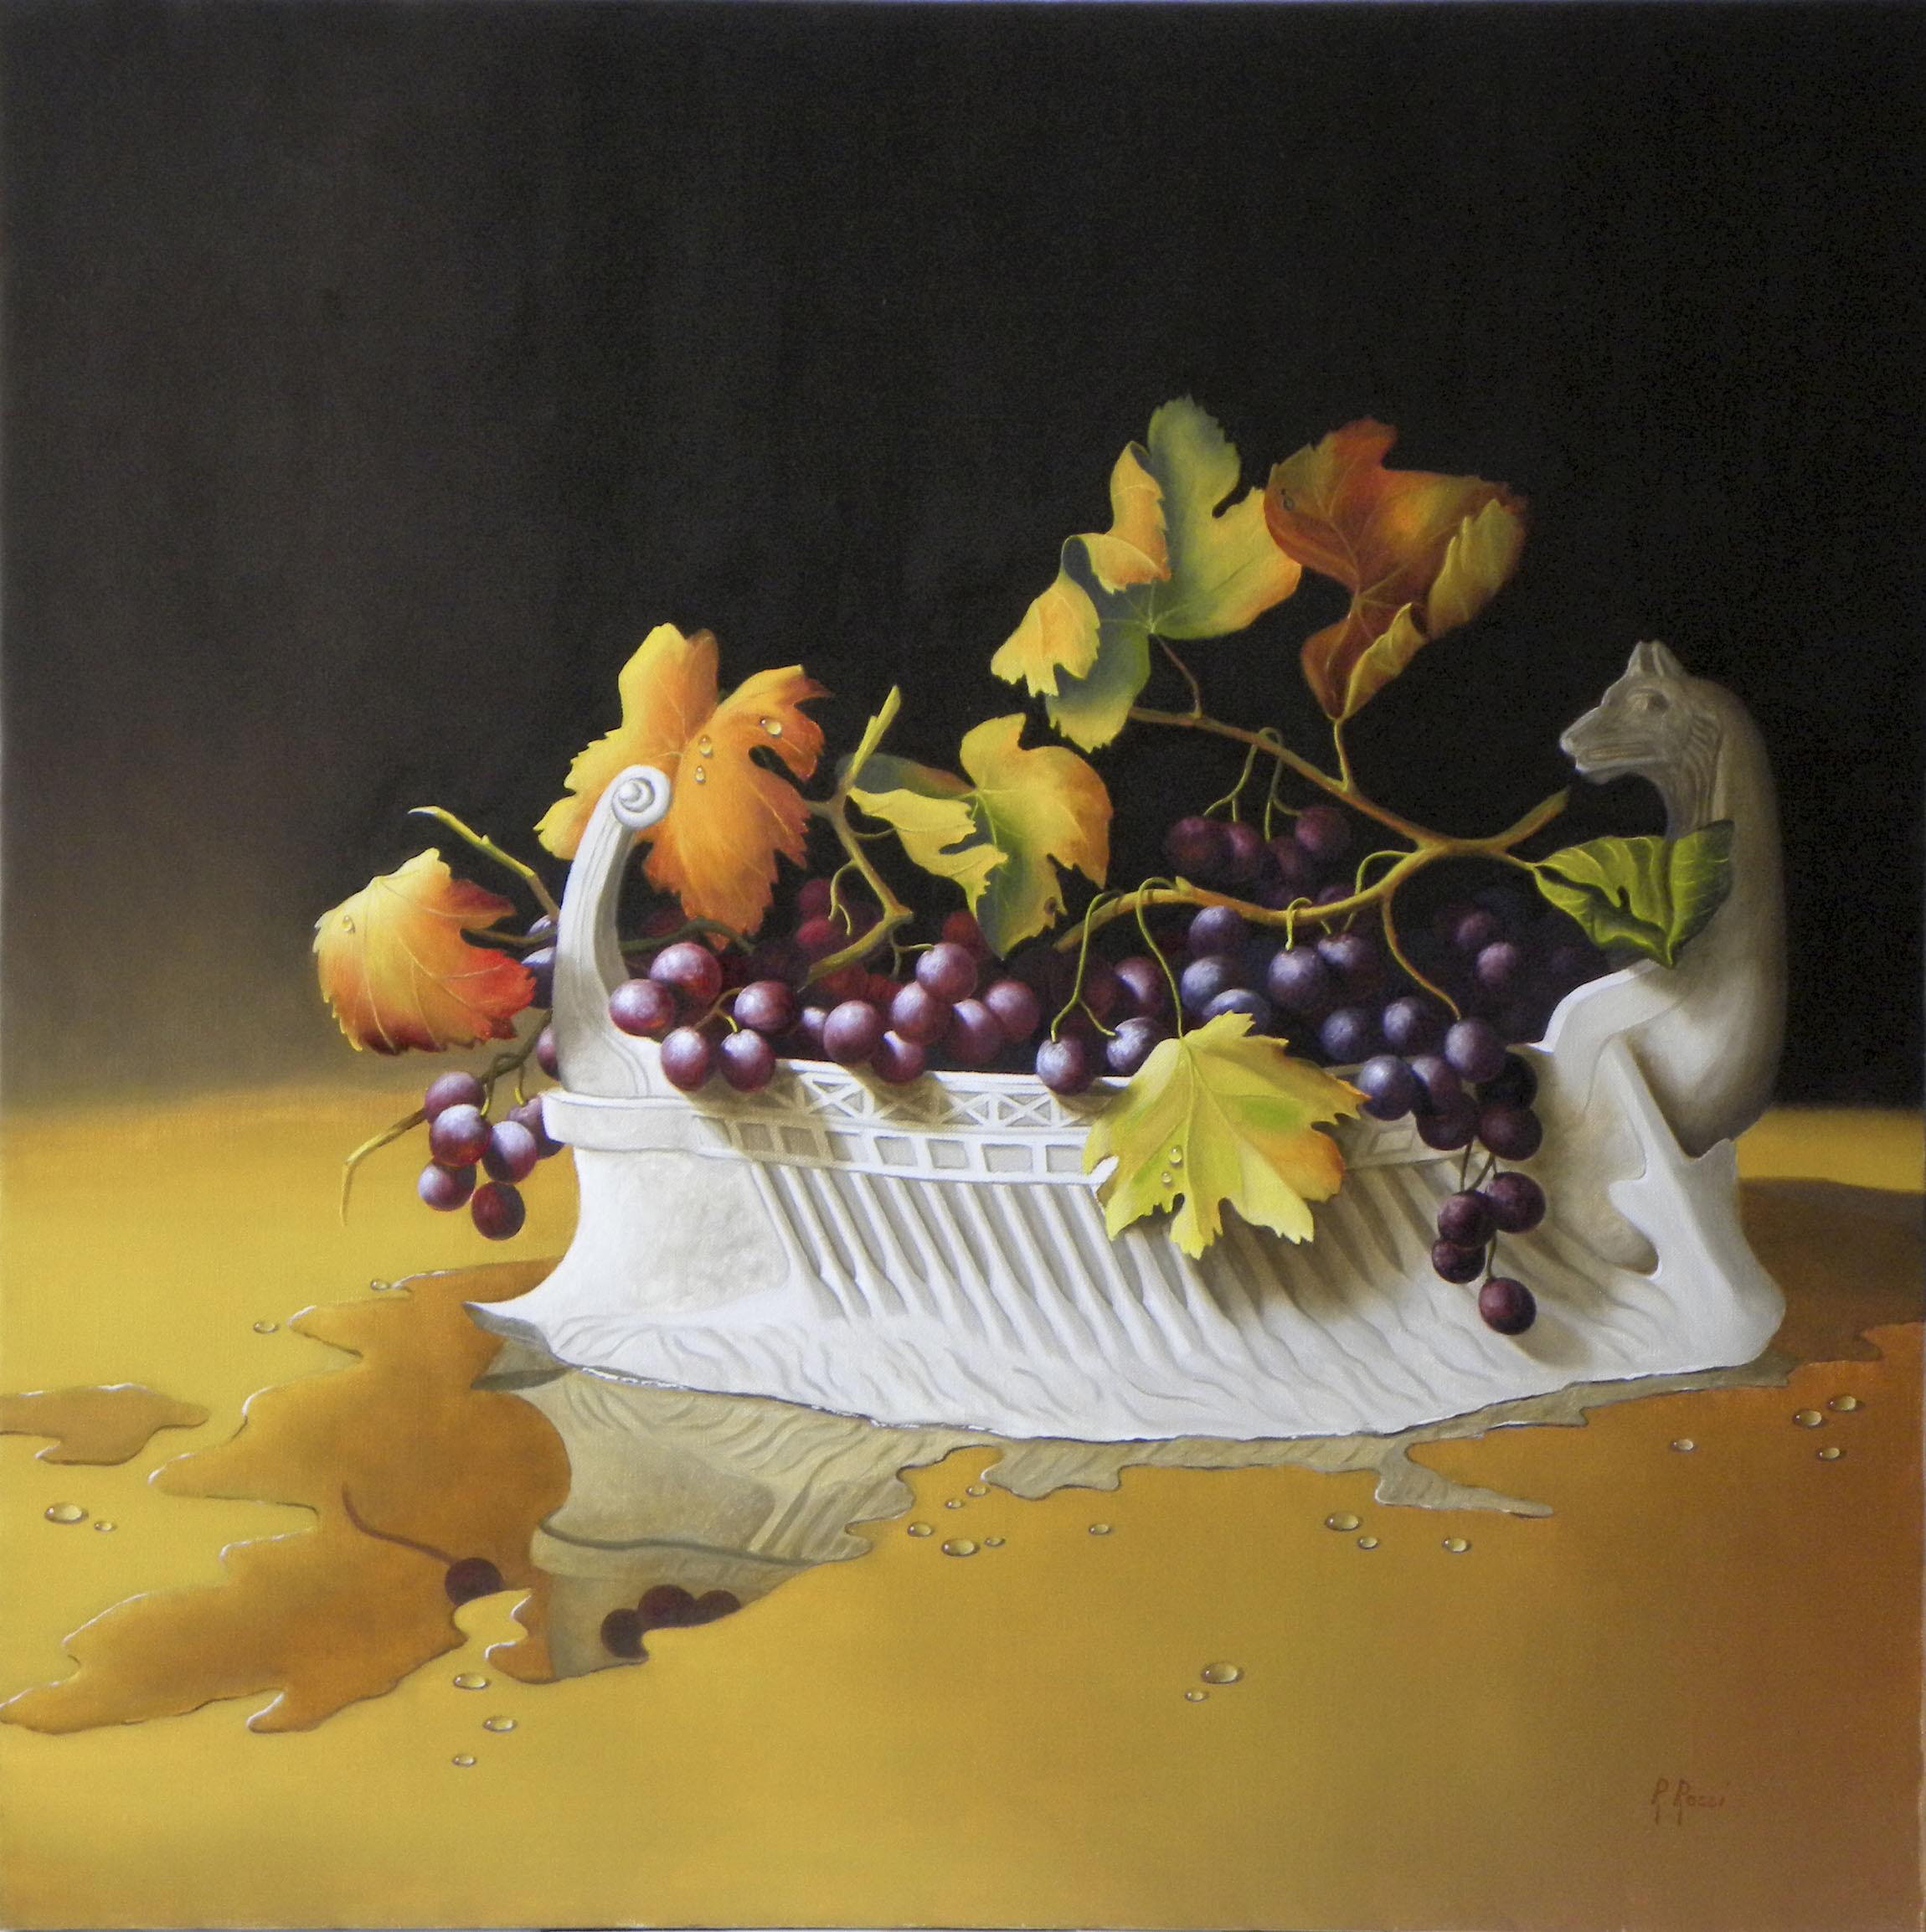 2012 roberta rossi - uva di dioniso - olio su tela - 70 x 70